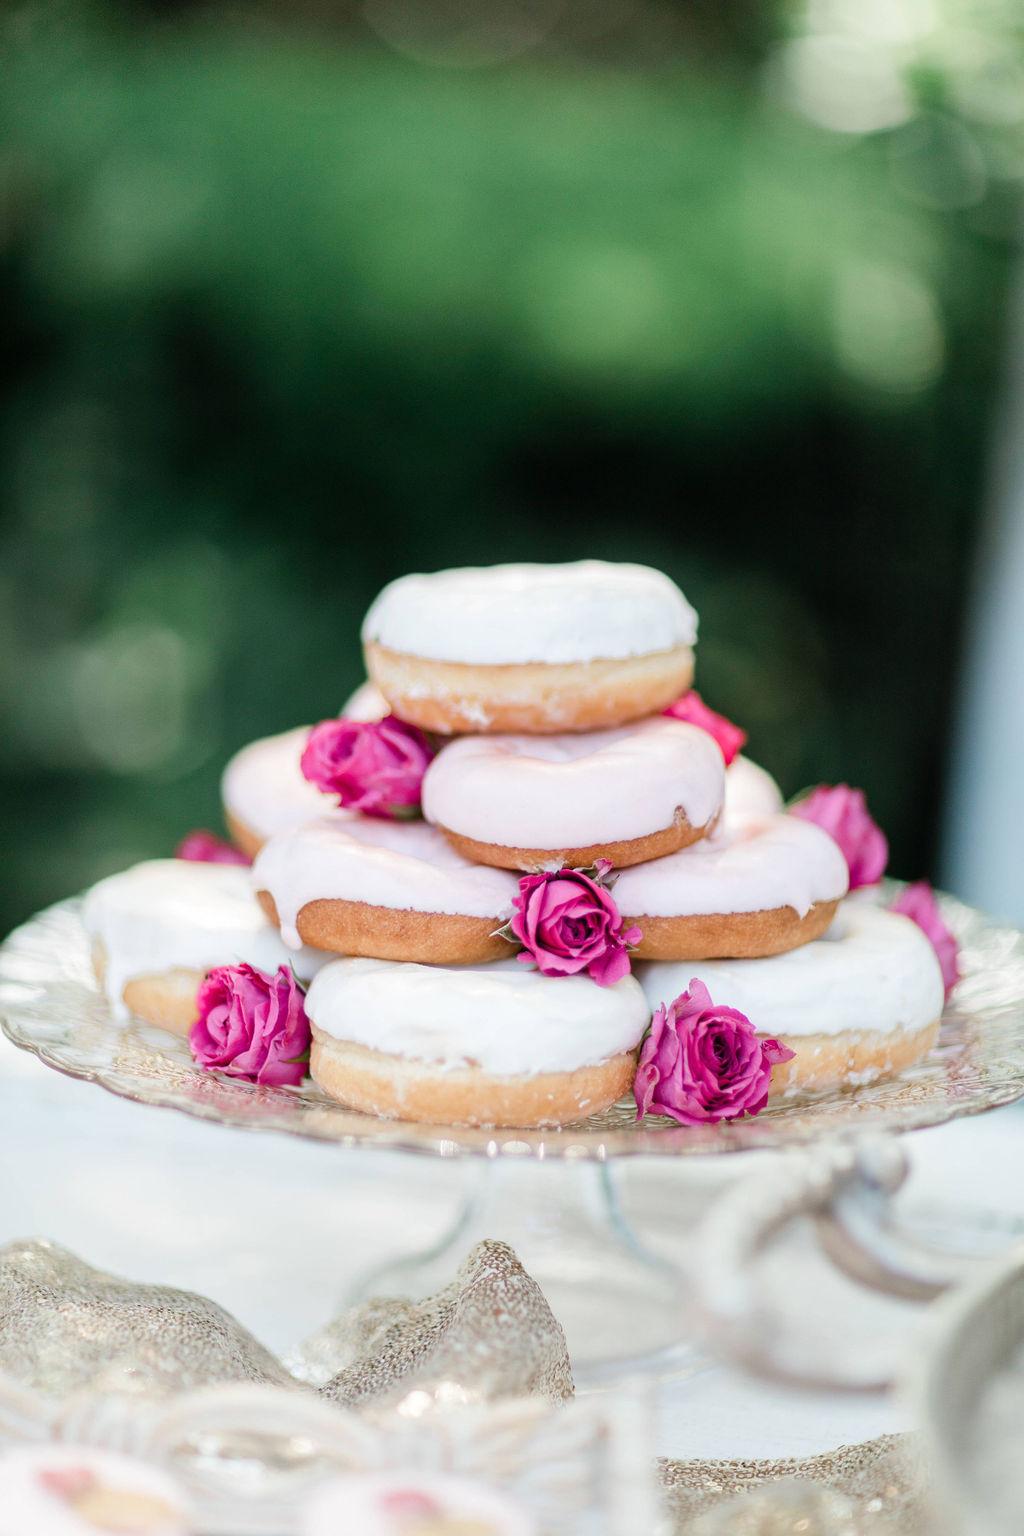 Kurtz-Orchards-Niagara-on-the-Lake-Styled-Wedding-Session-Shotlife-Studio-Calderone-Co-Luxury-Events-Vineyard-Bride-28.JPG